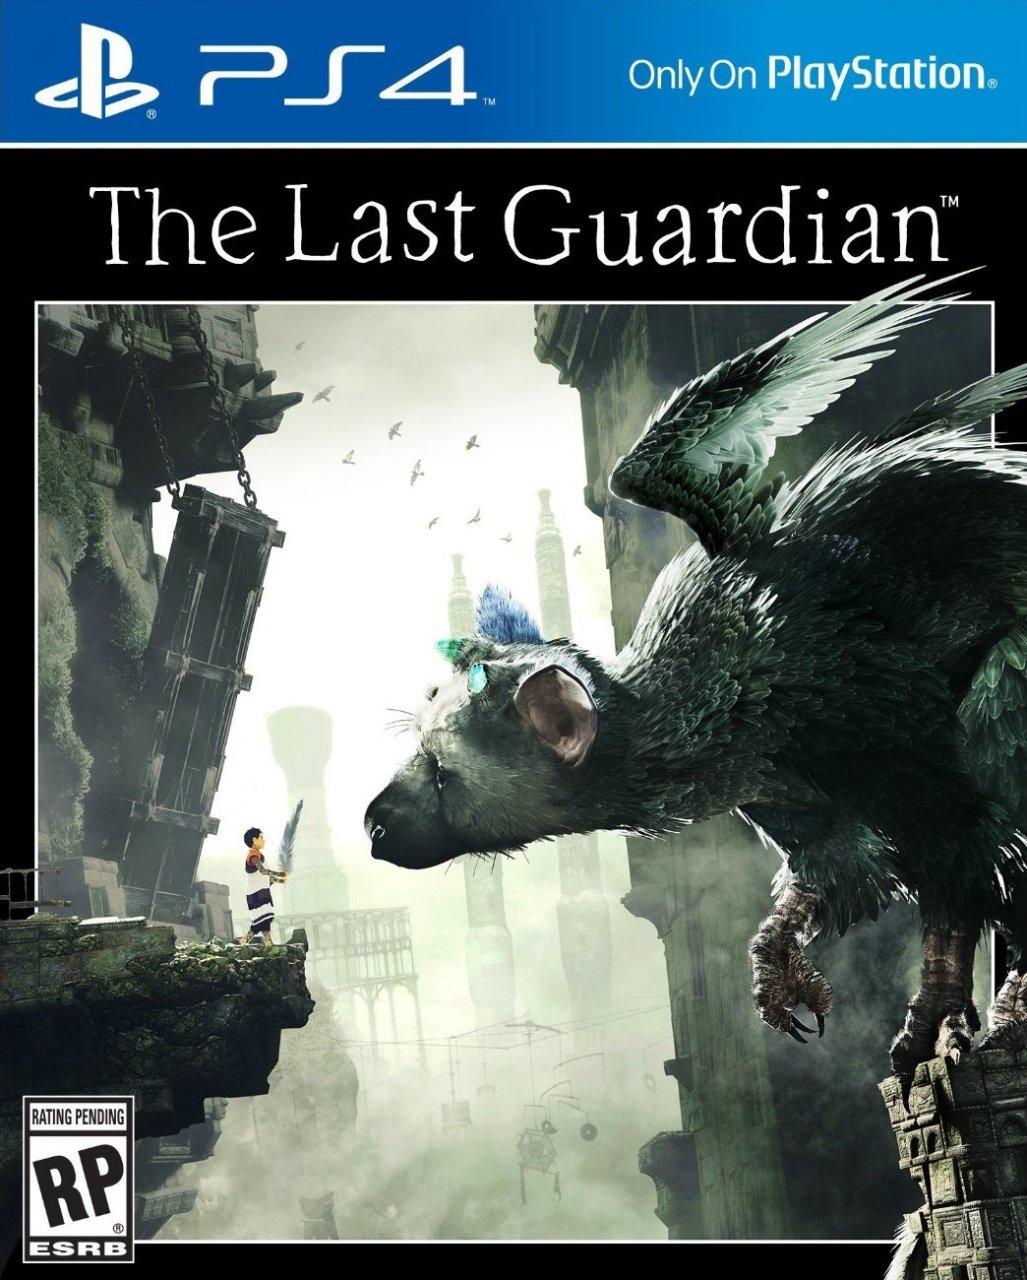 The Last Guardian [Box Art]